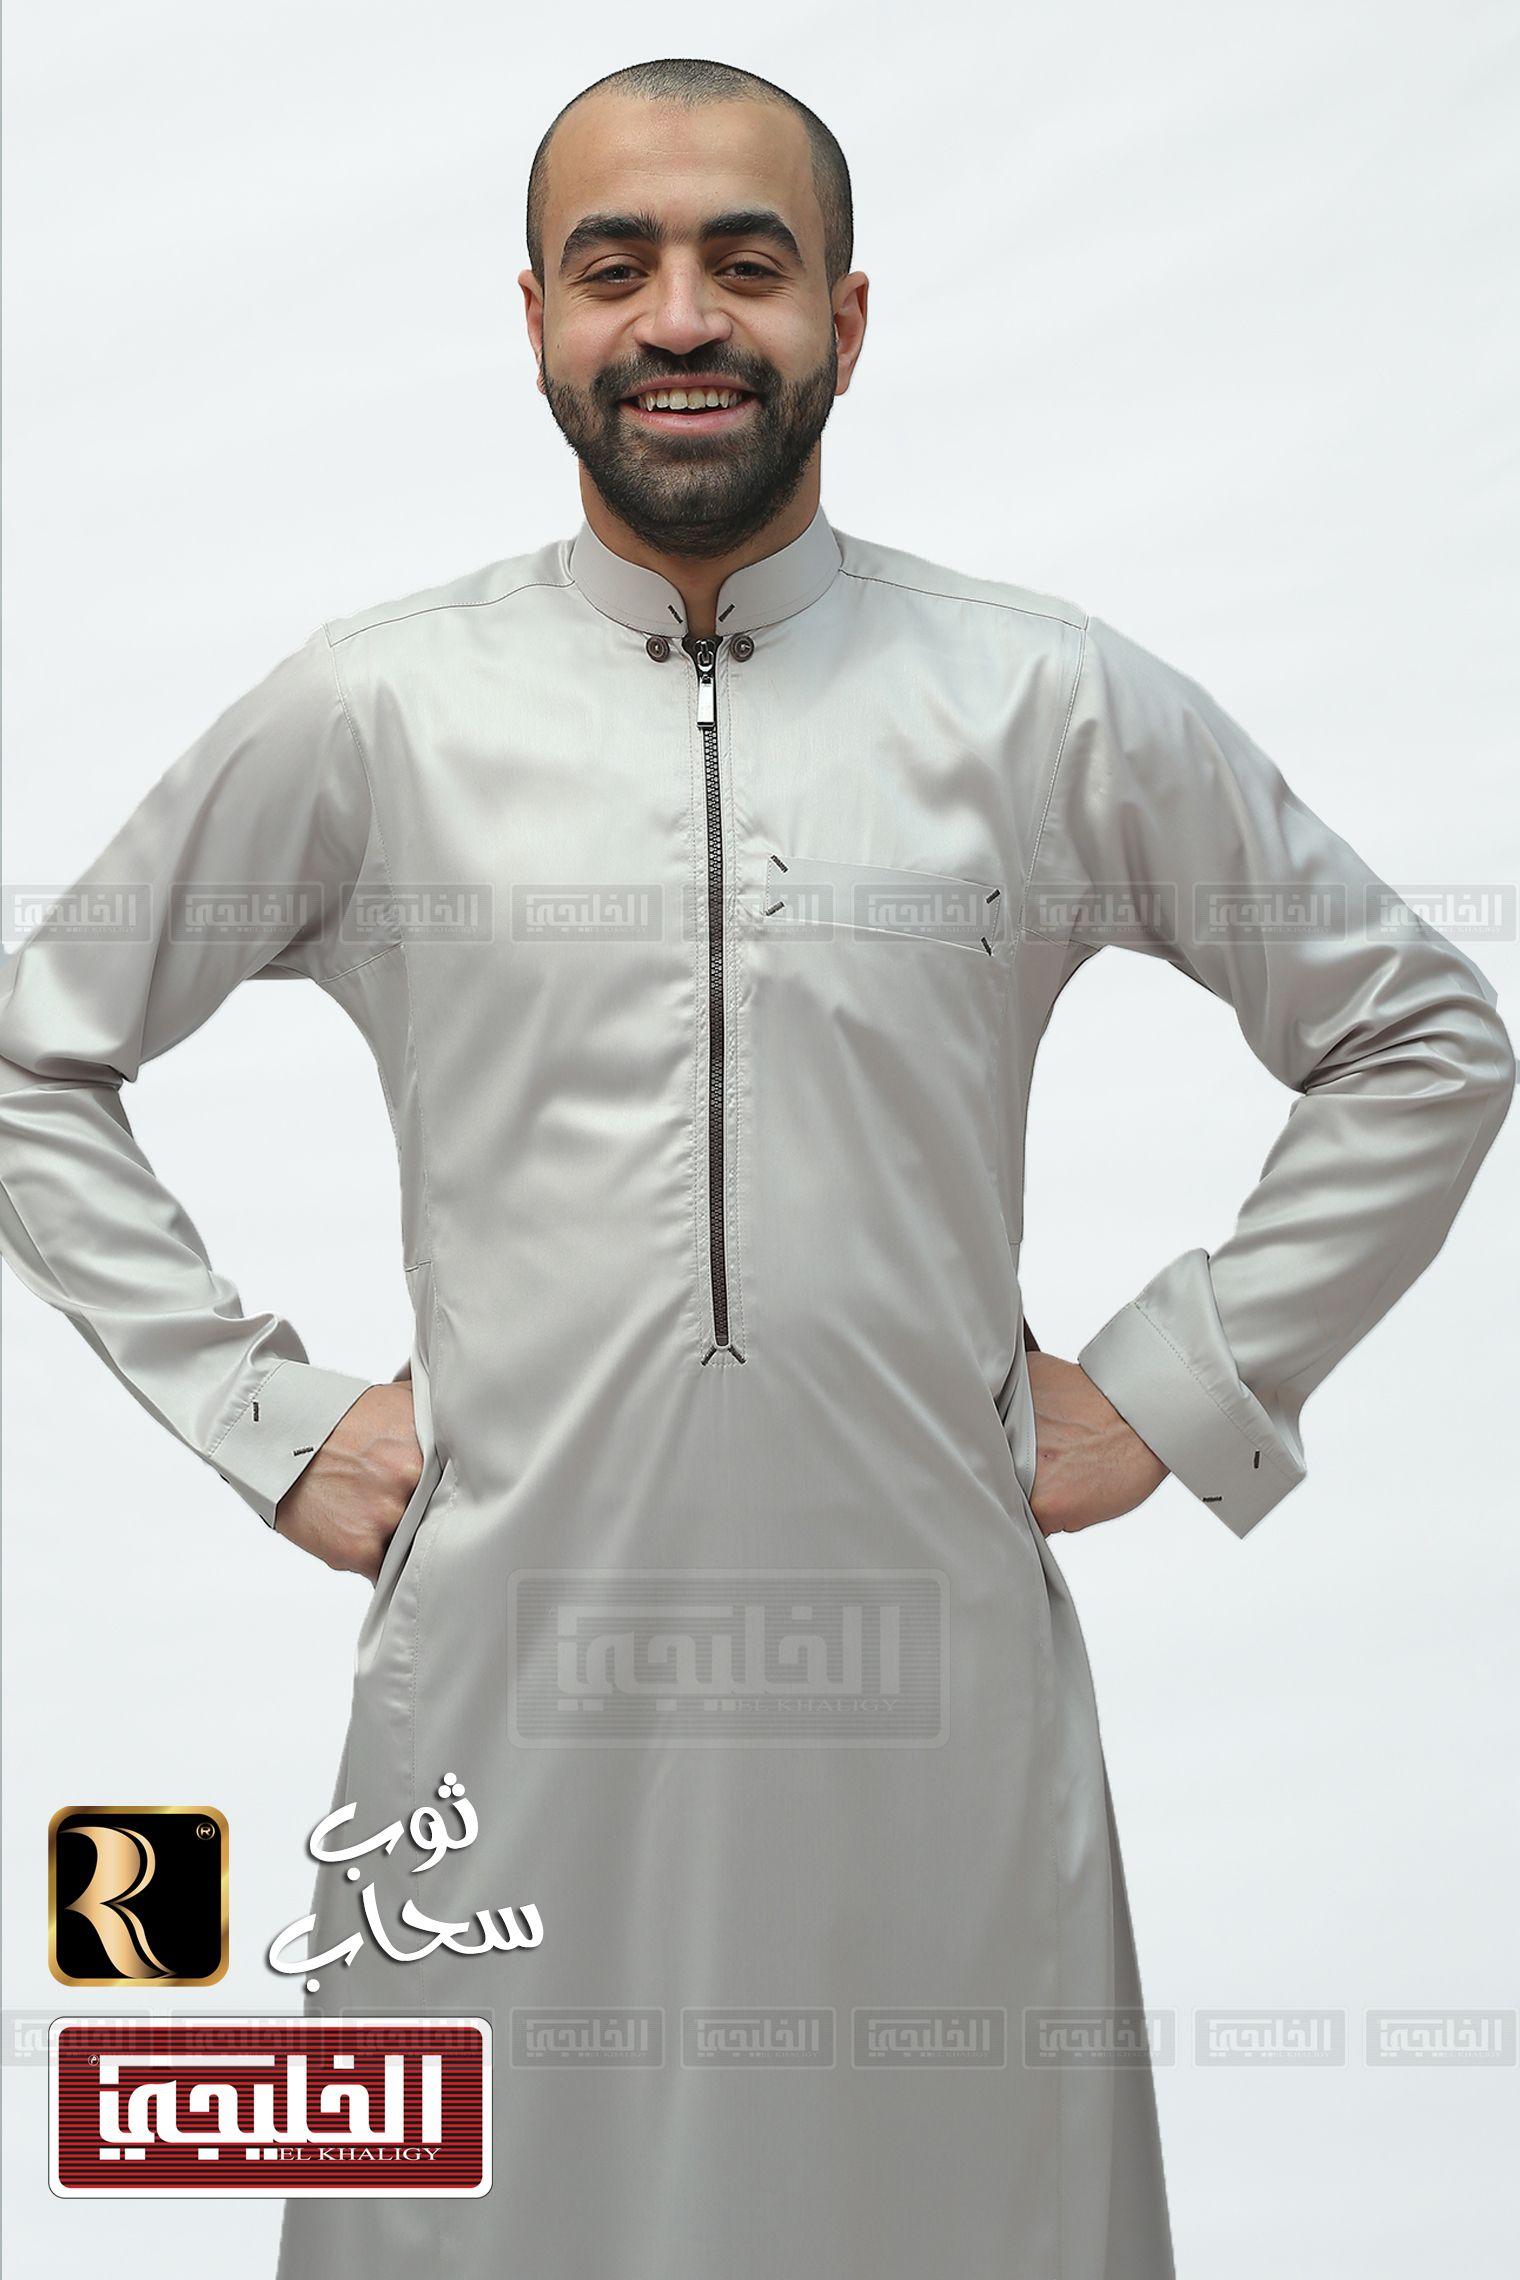 ثوب سحاب Mens Tops Mens Tshirts Athletic Jacket